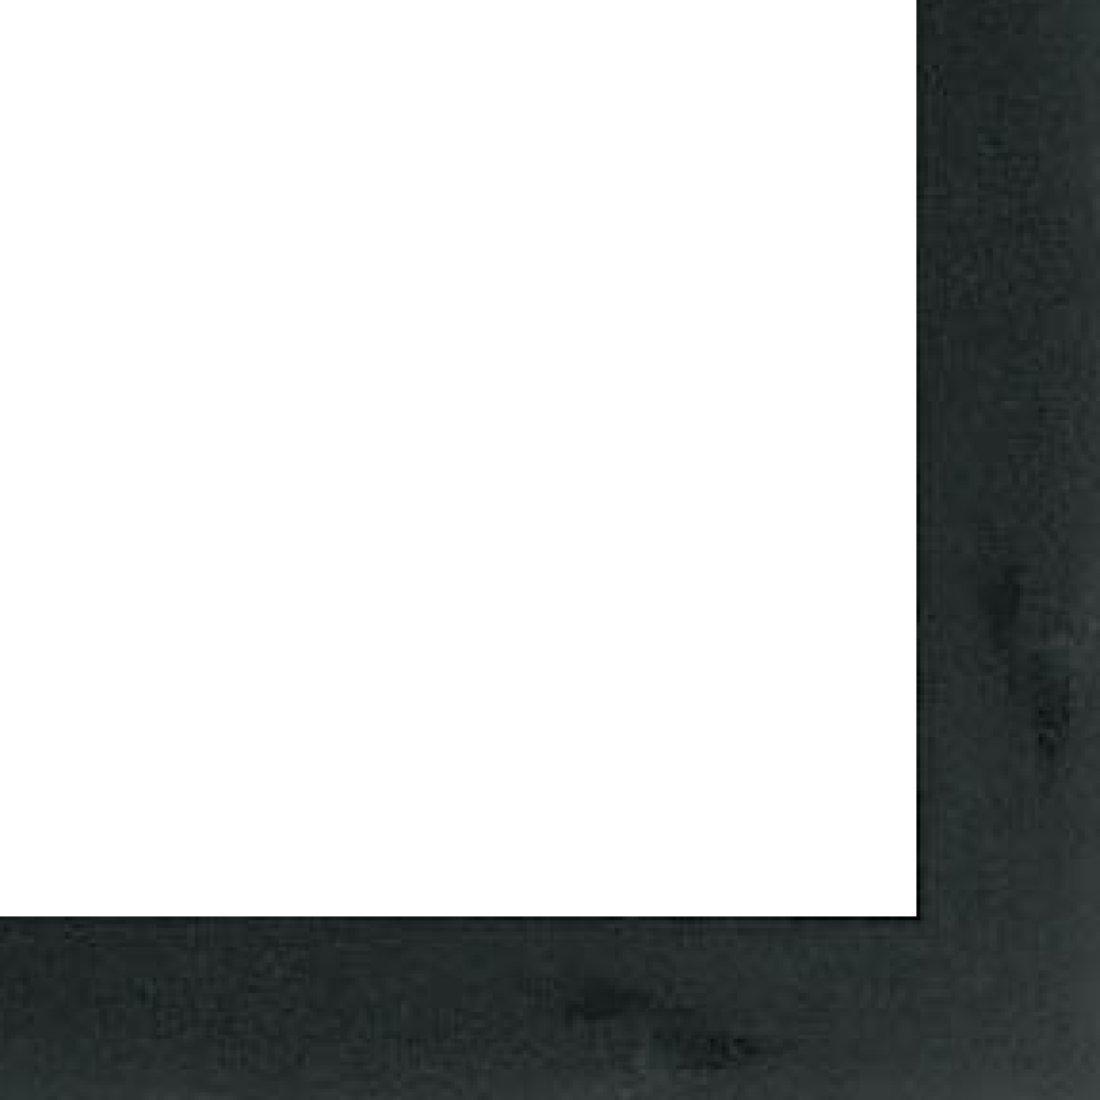 Picture Frame Moulding (Wood) 18ft bundle - Contemporary Black Finish - 0.75'' width - 5/16'' rabbet depth